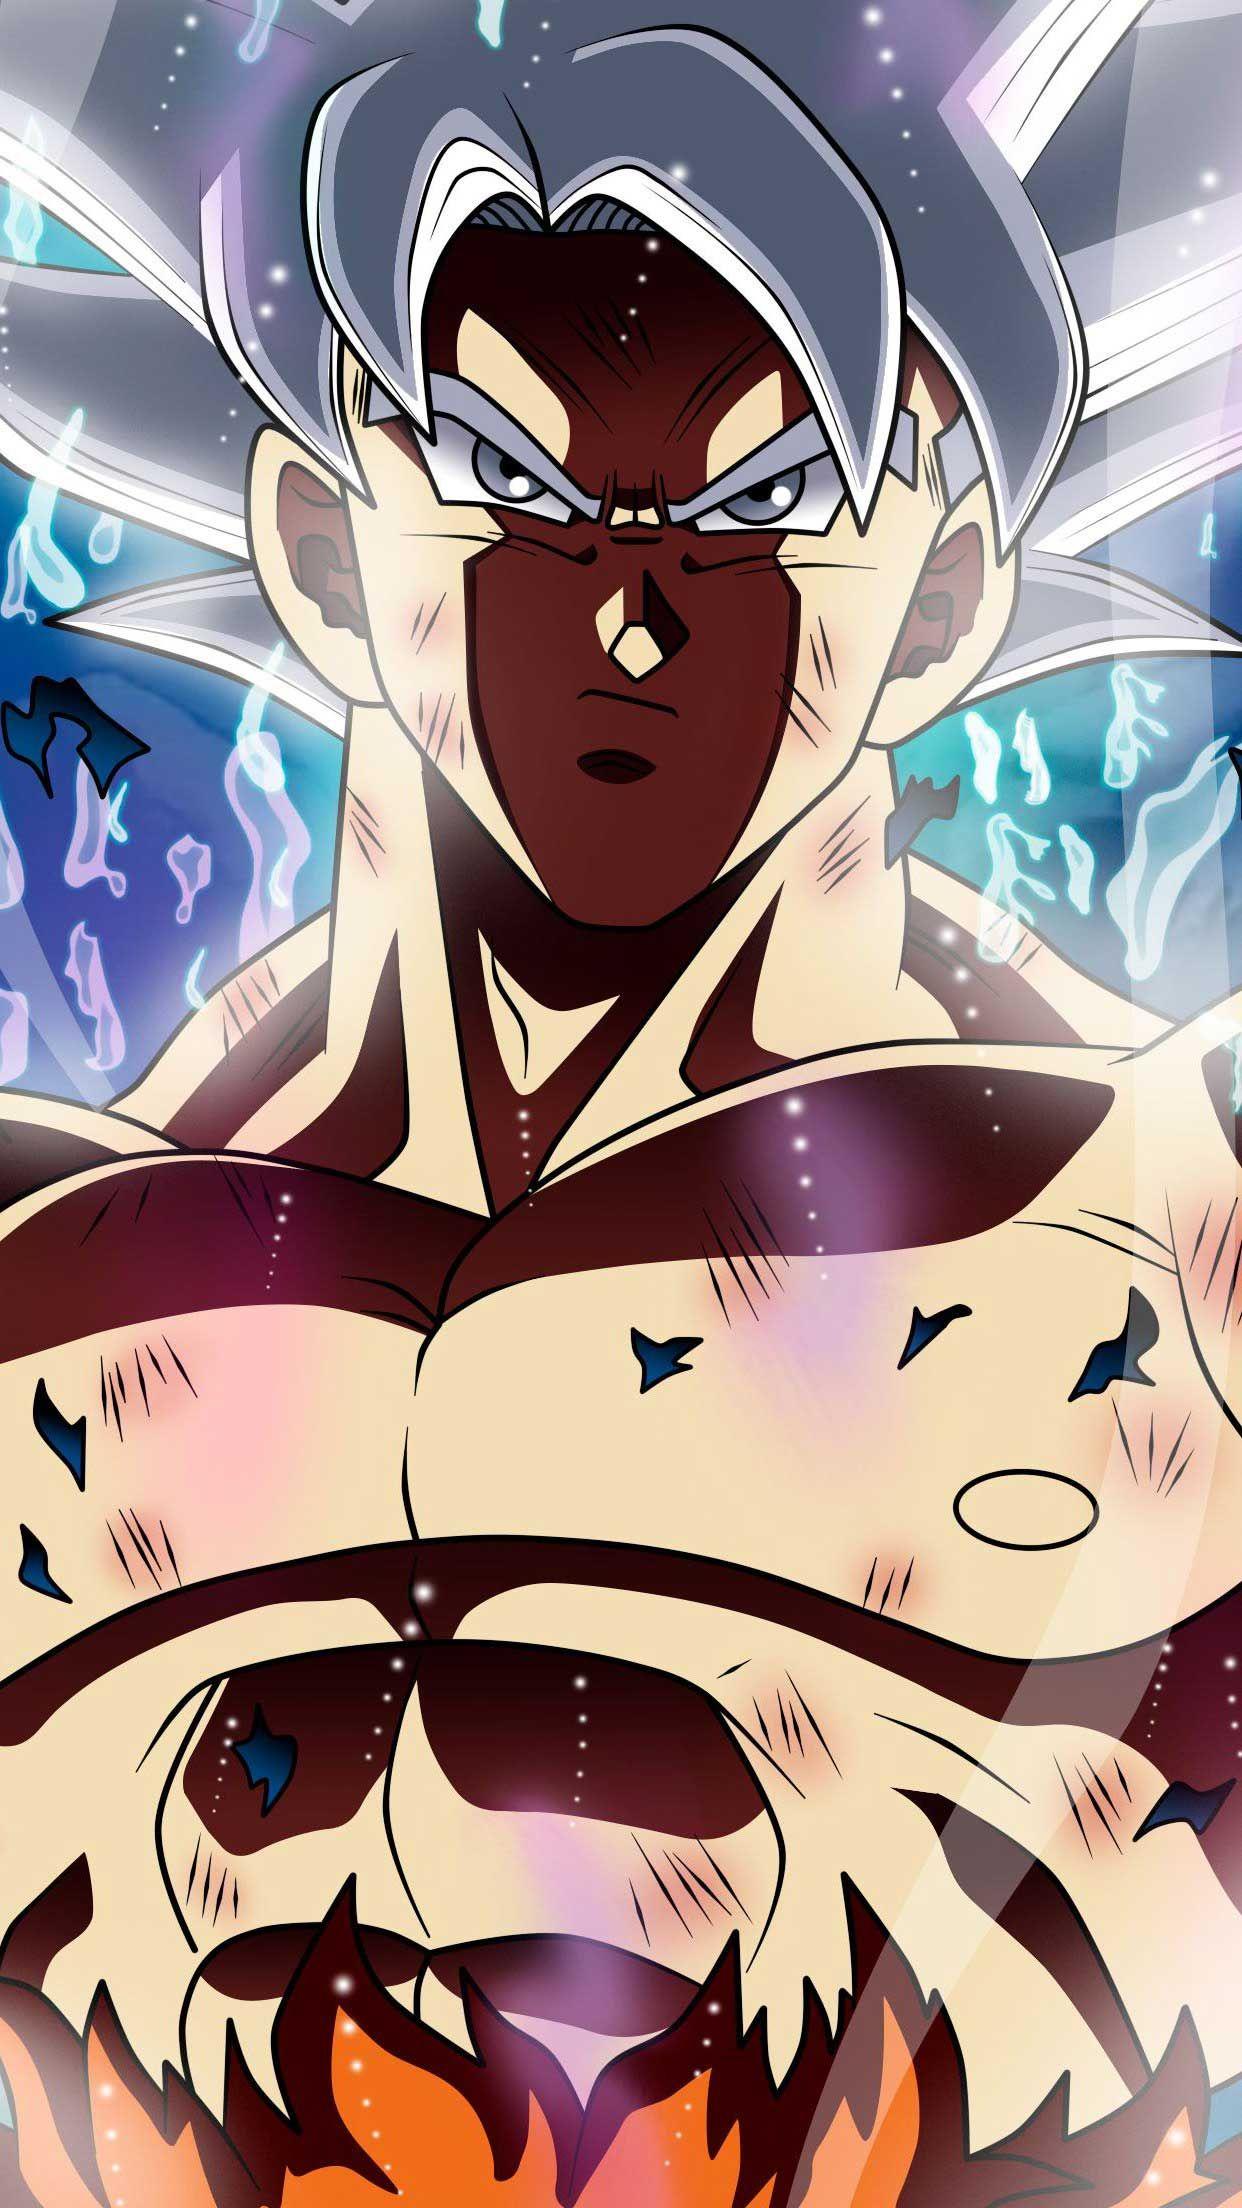 Ultra Instinct Goku Dragon Ball K P Iphone Wallpapers Hd Dragon Ball Art Anime Dragon Ball Super Goku Wallpaper